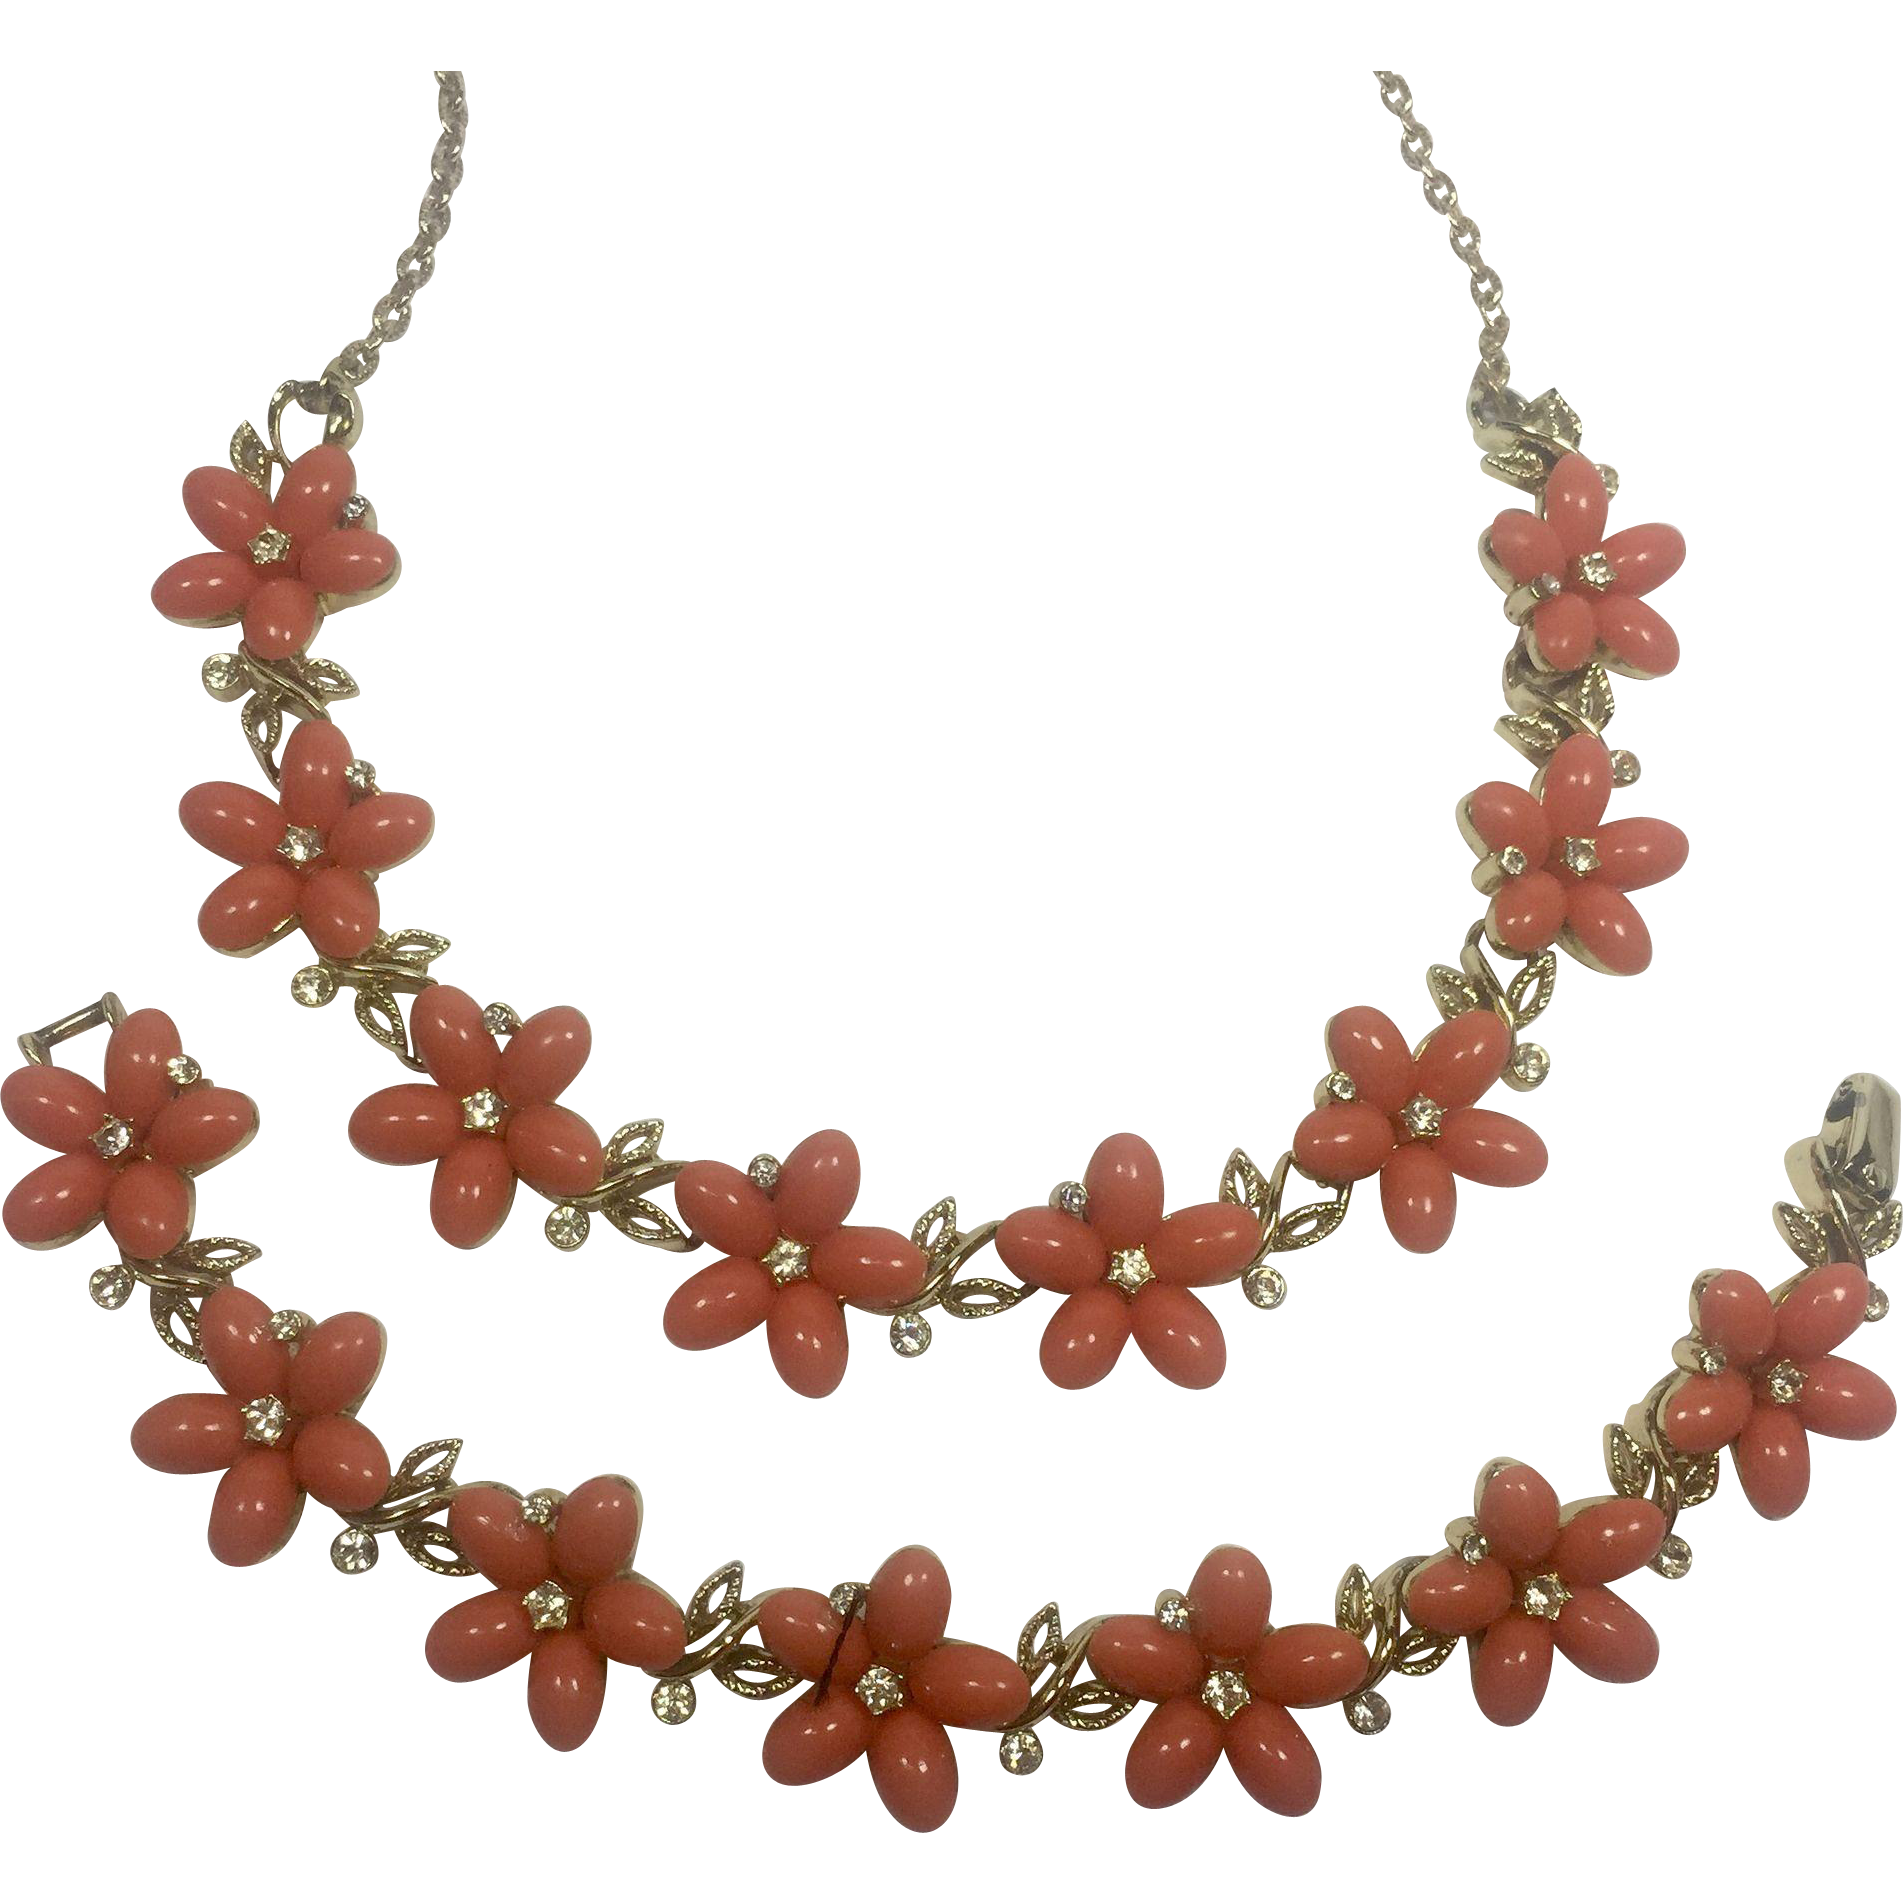 Vintage Plastic Flower Rhinestone Necklace Bracelet Lisner